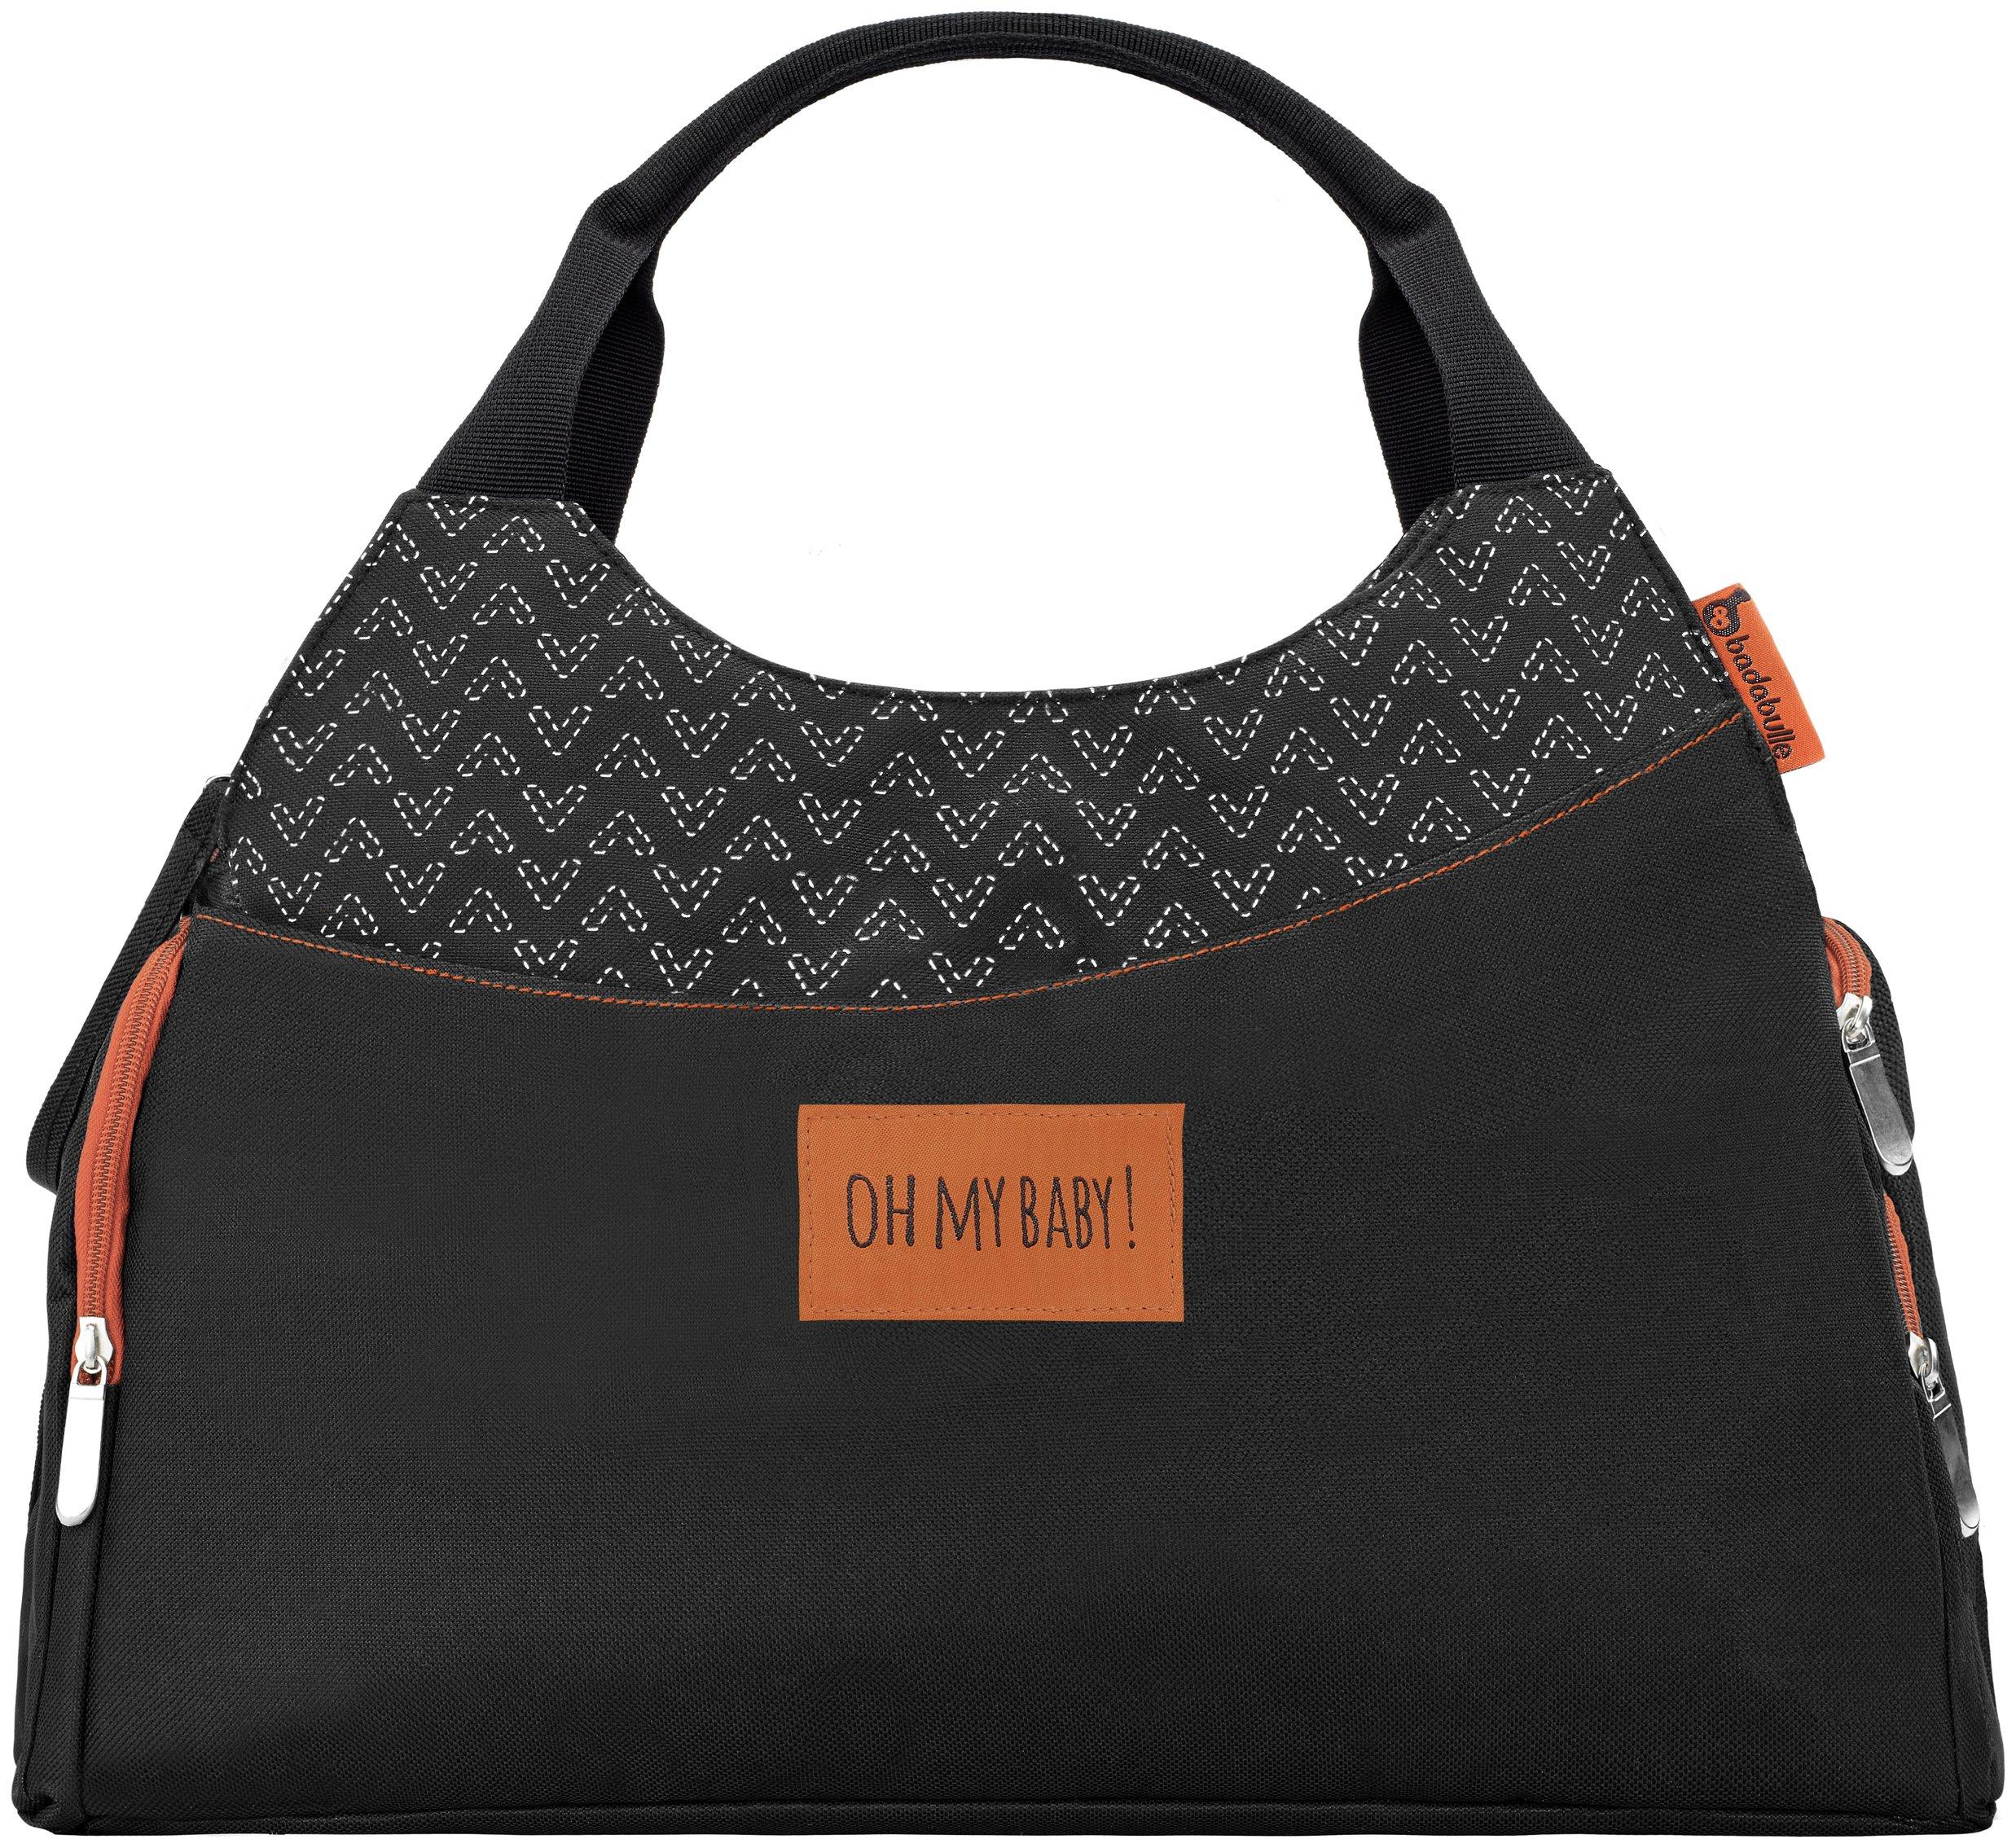 Badabulle Multipocket Changing Bag - Black